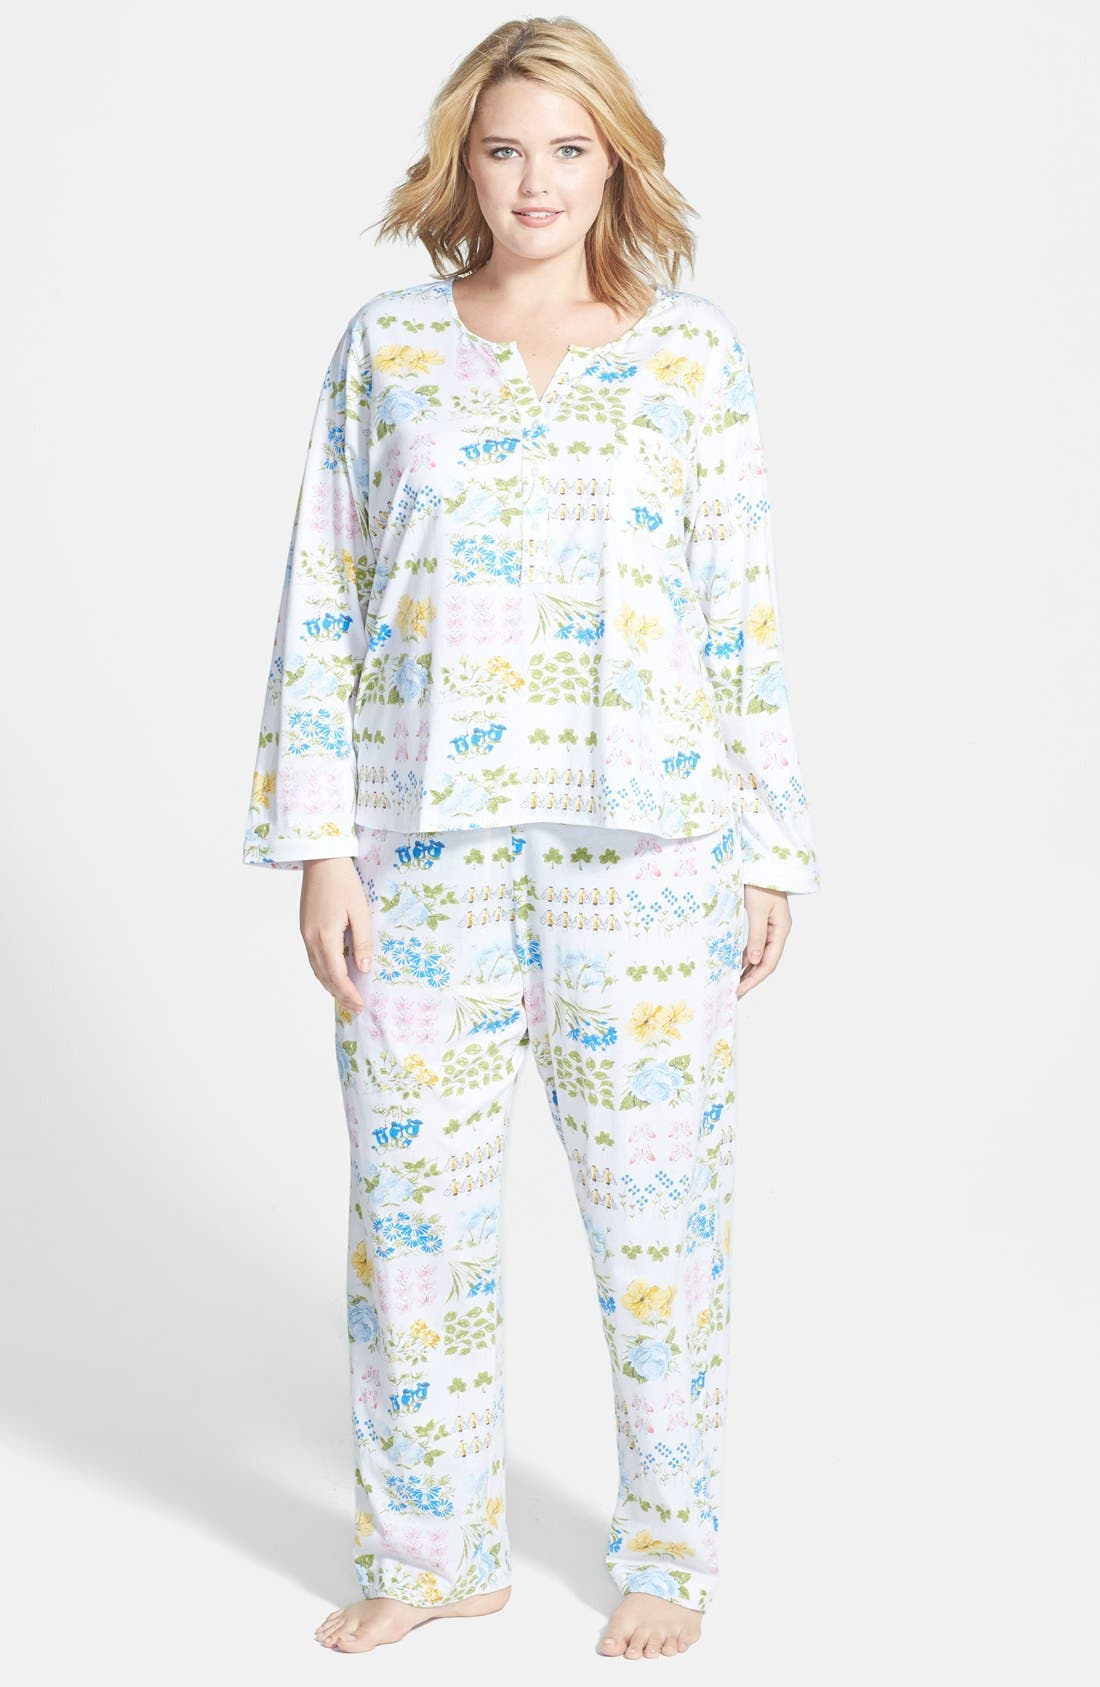 Main Image - Carole Hochman Designs 'Butterfly Garden' Pajamas (Plus Size)